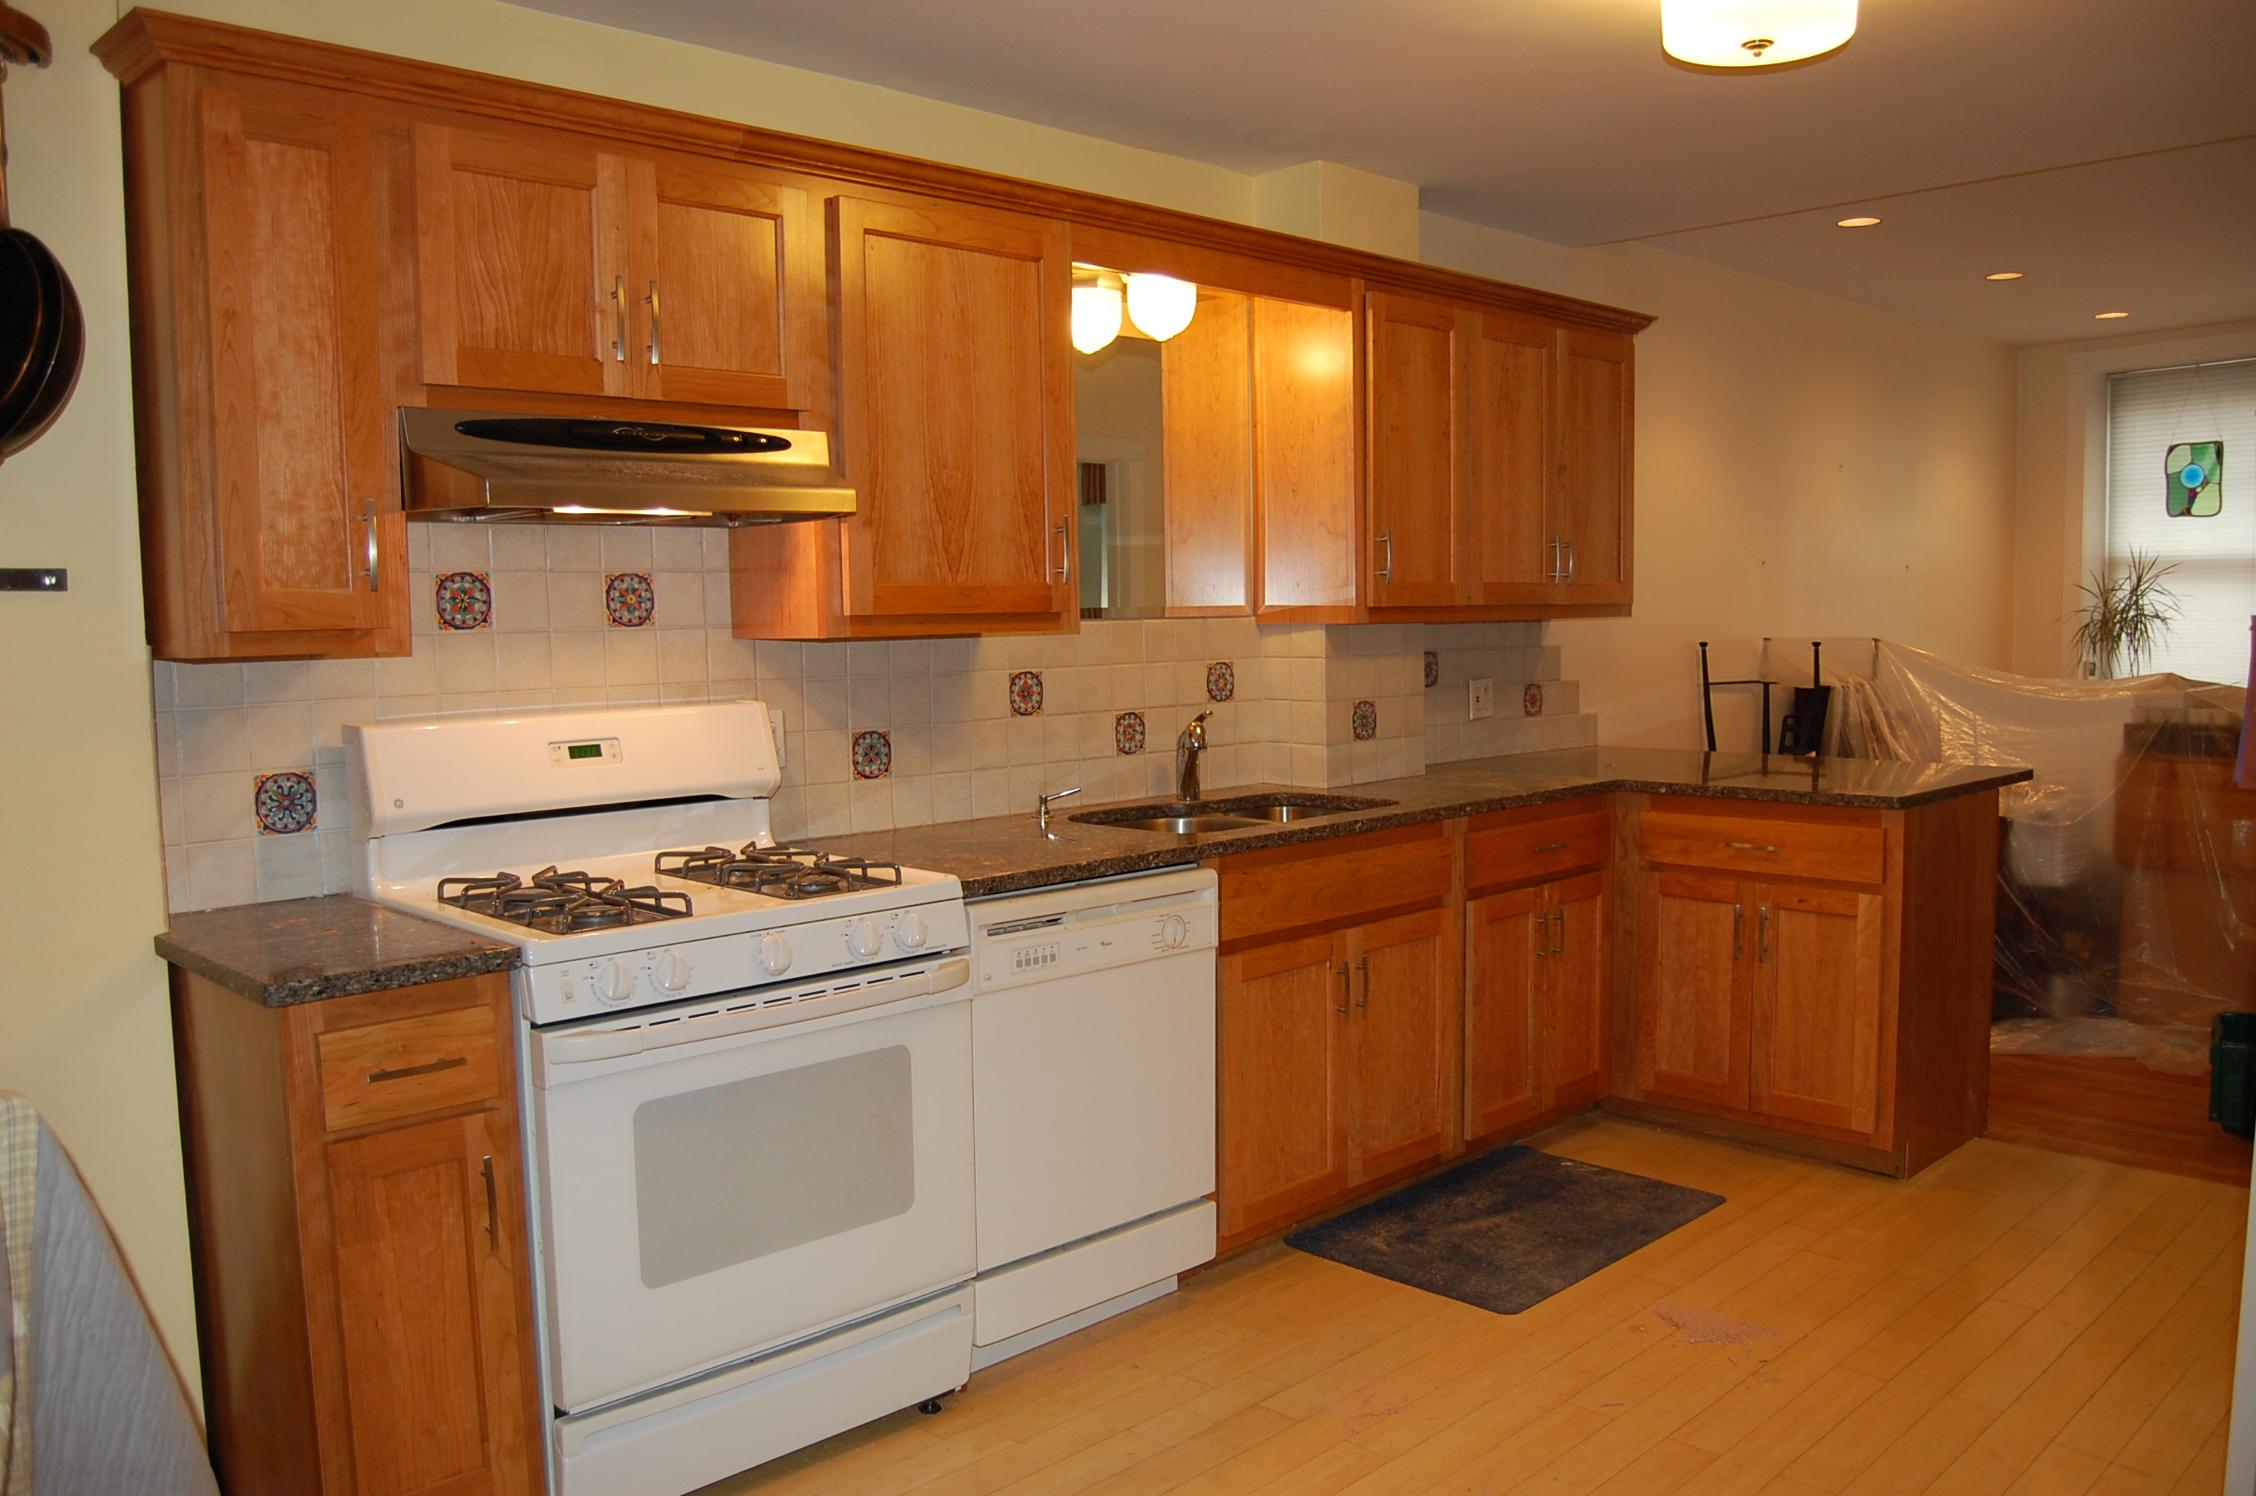 diy kitchen cabinet refacing refacing kitchen cabinets Diy Kitchen Cabinet Refacing Video